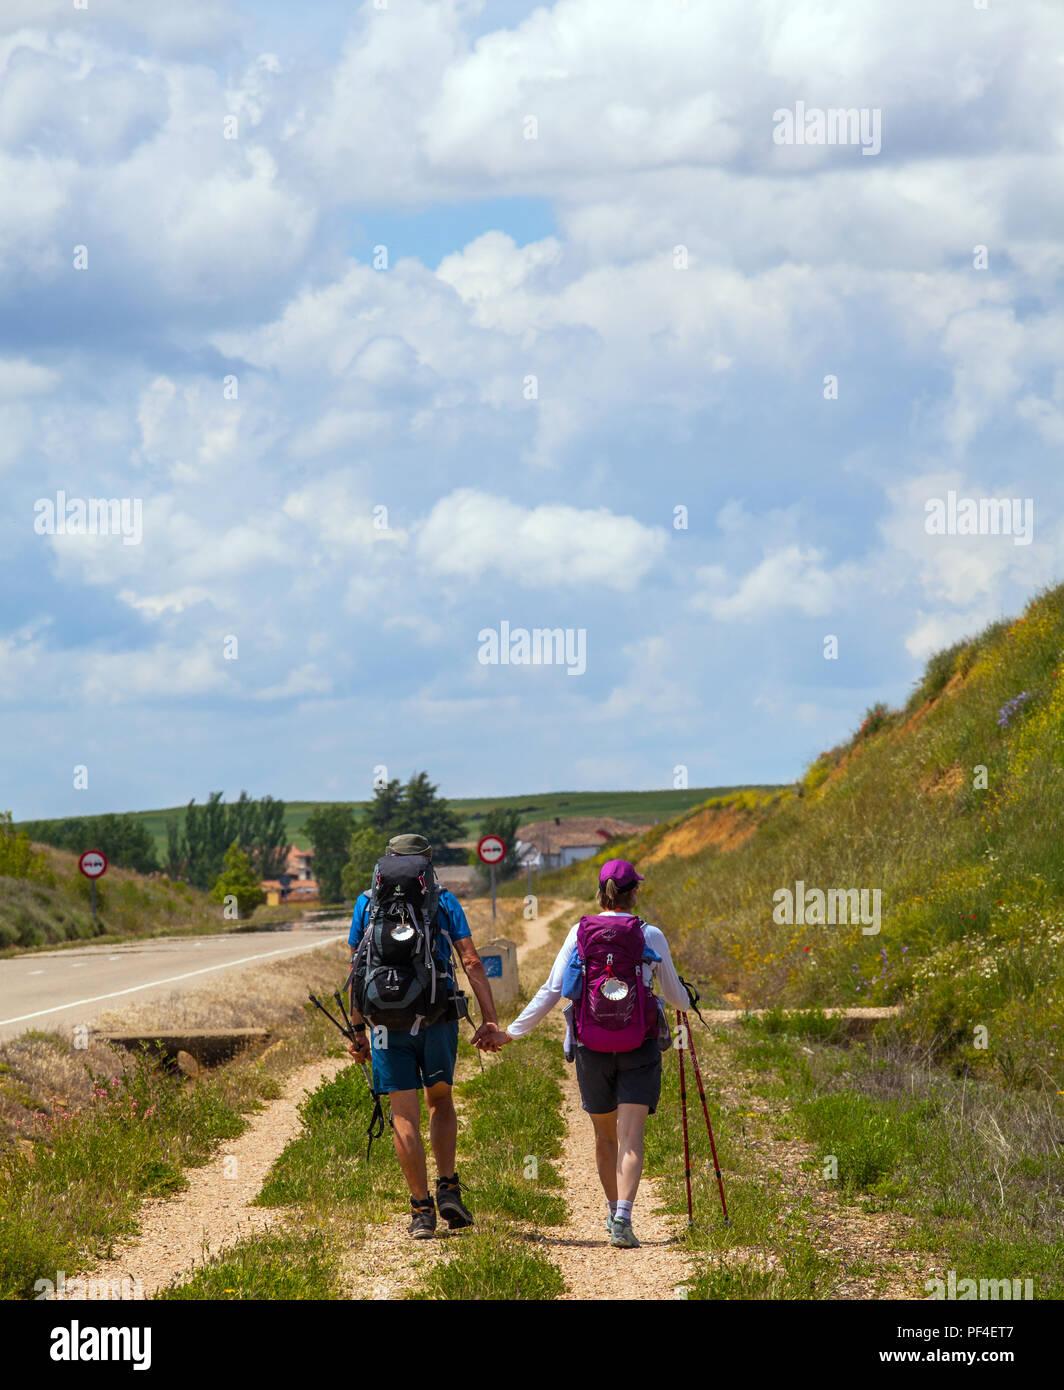 Man and woman couple pilgrims holding hands walking the Camino de Santiago the way of St James walking towards Villalcazar de Sirga Spain - Stock Image